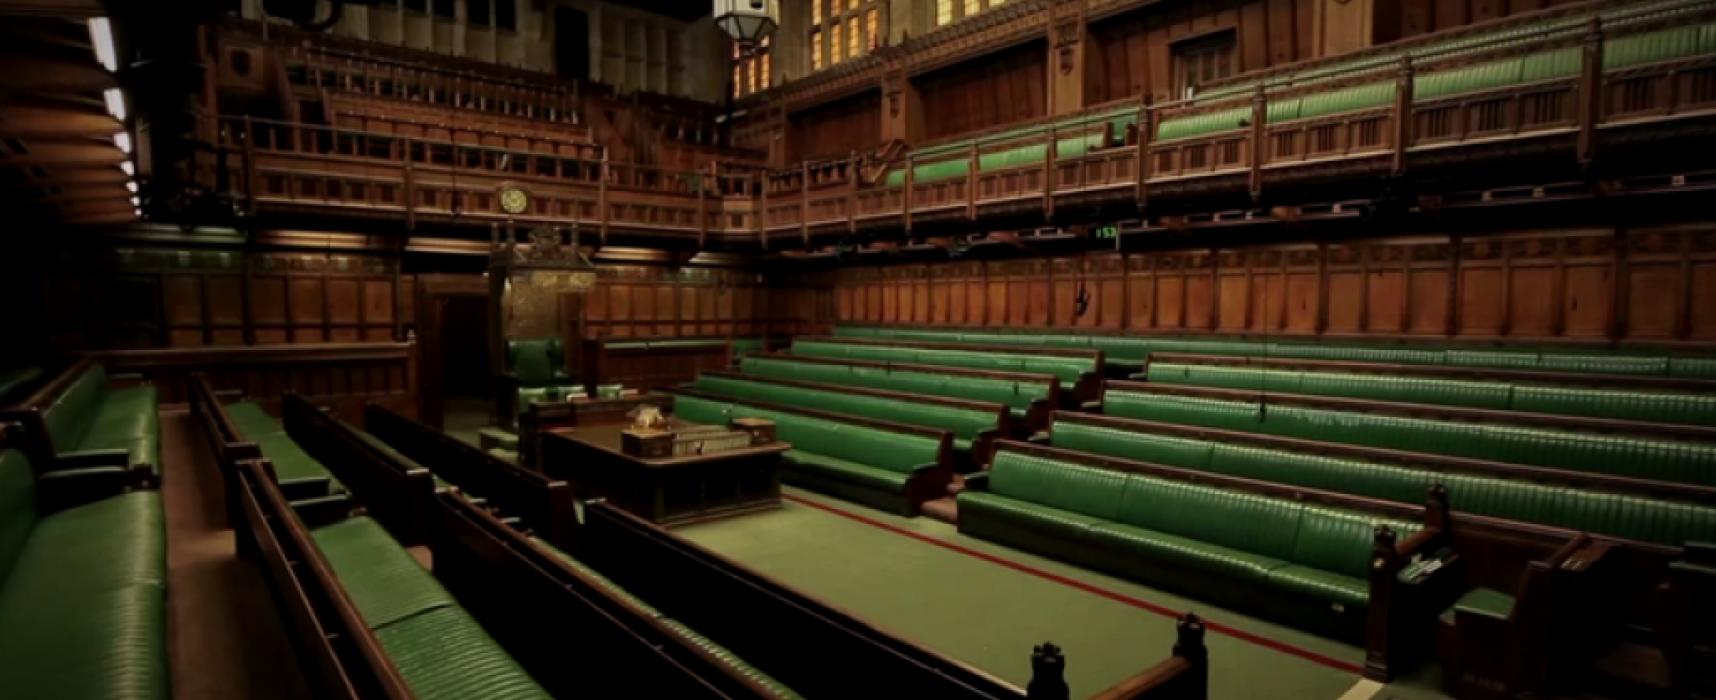 Velká Británie zavede daň ze lživých zpráv